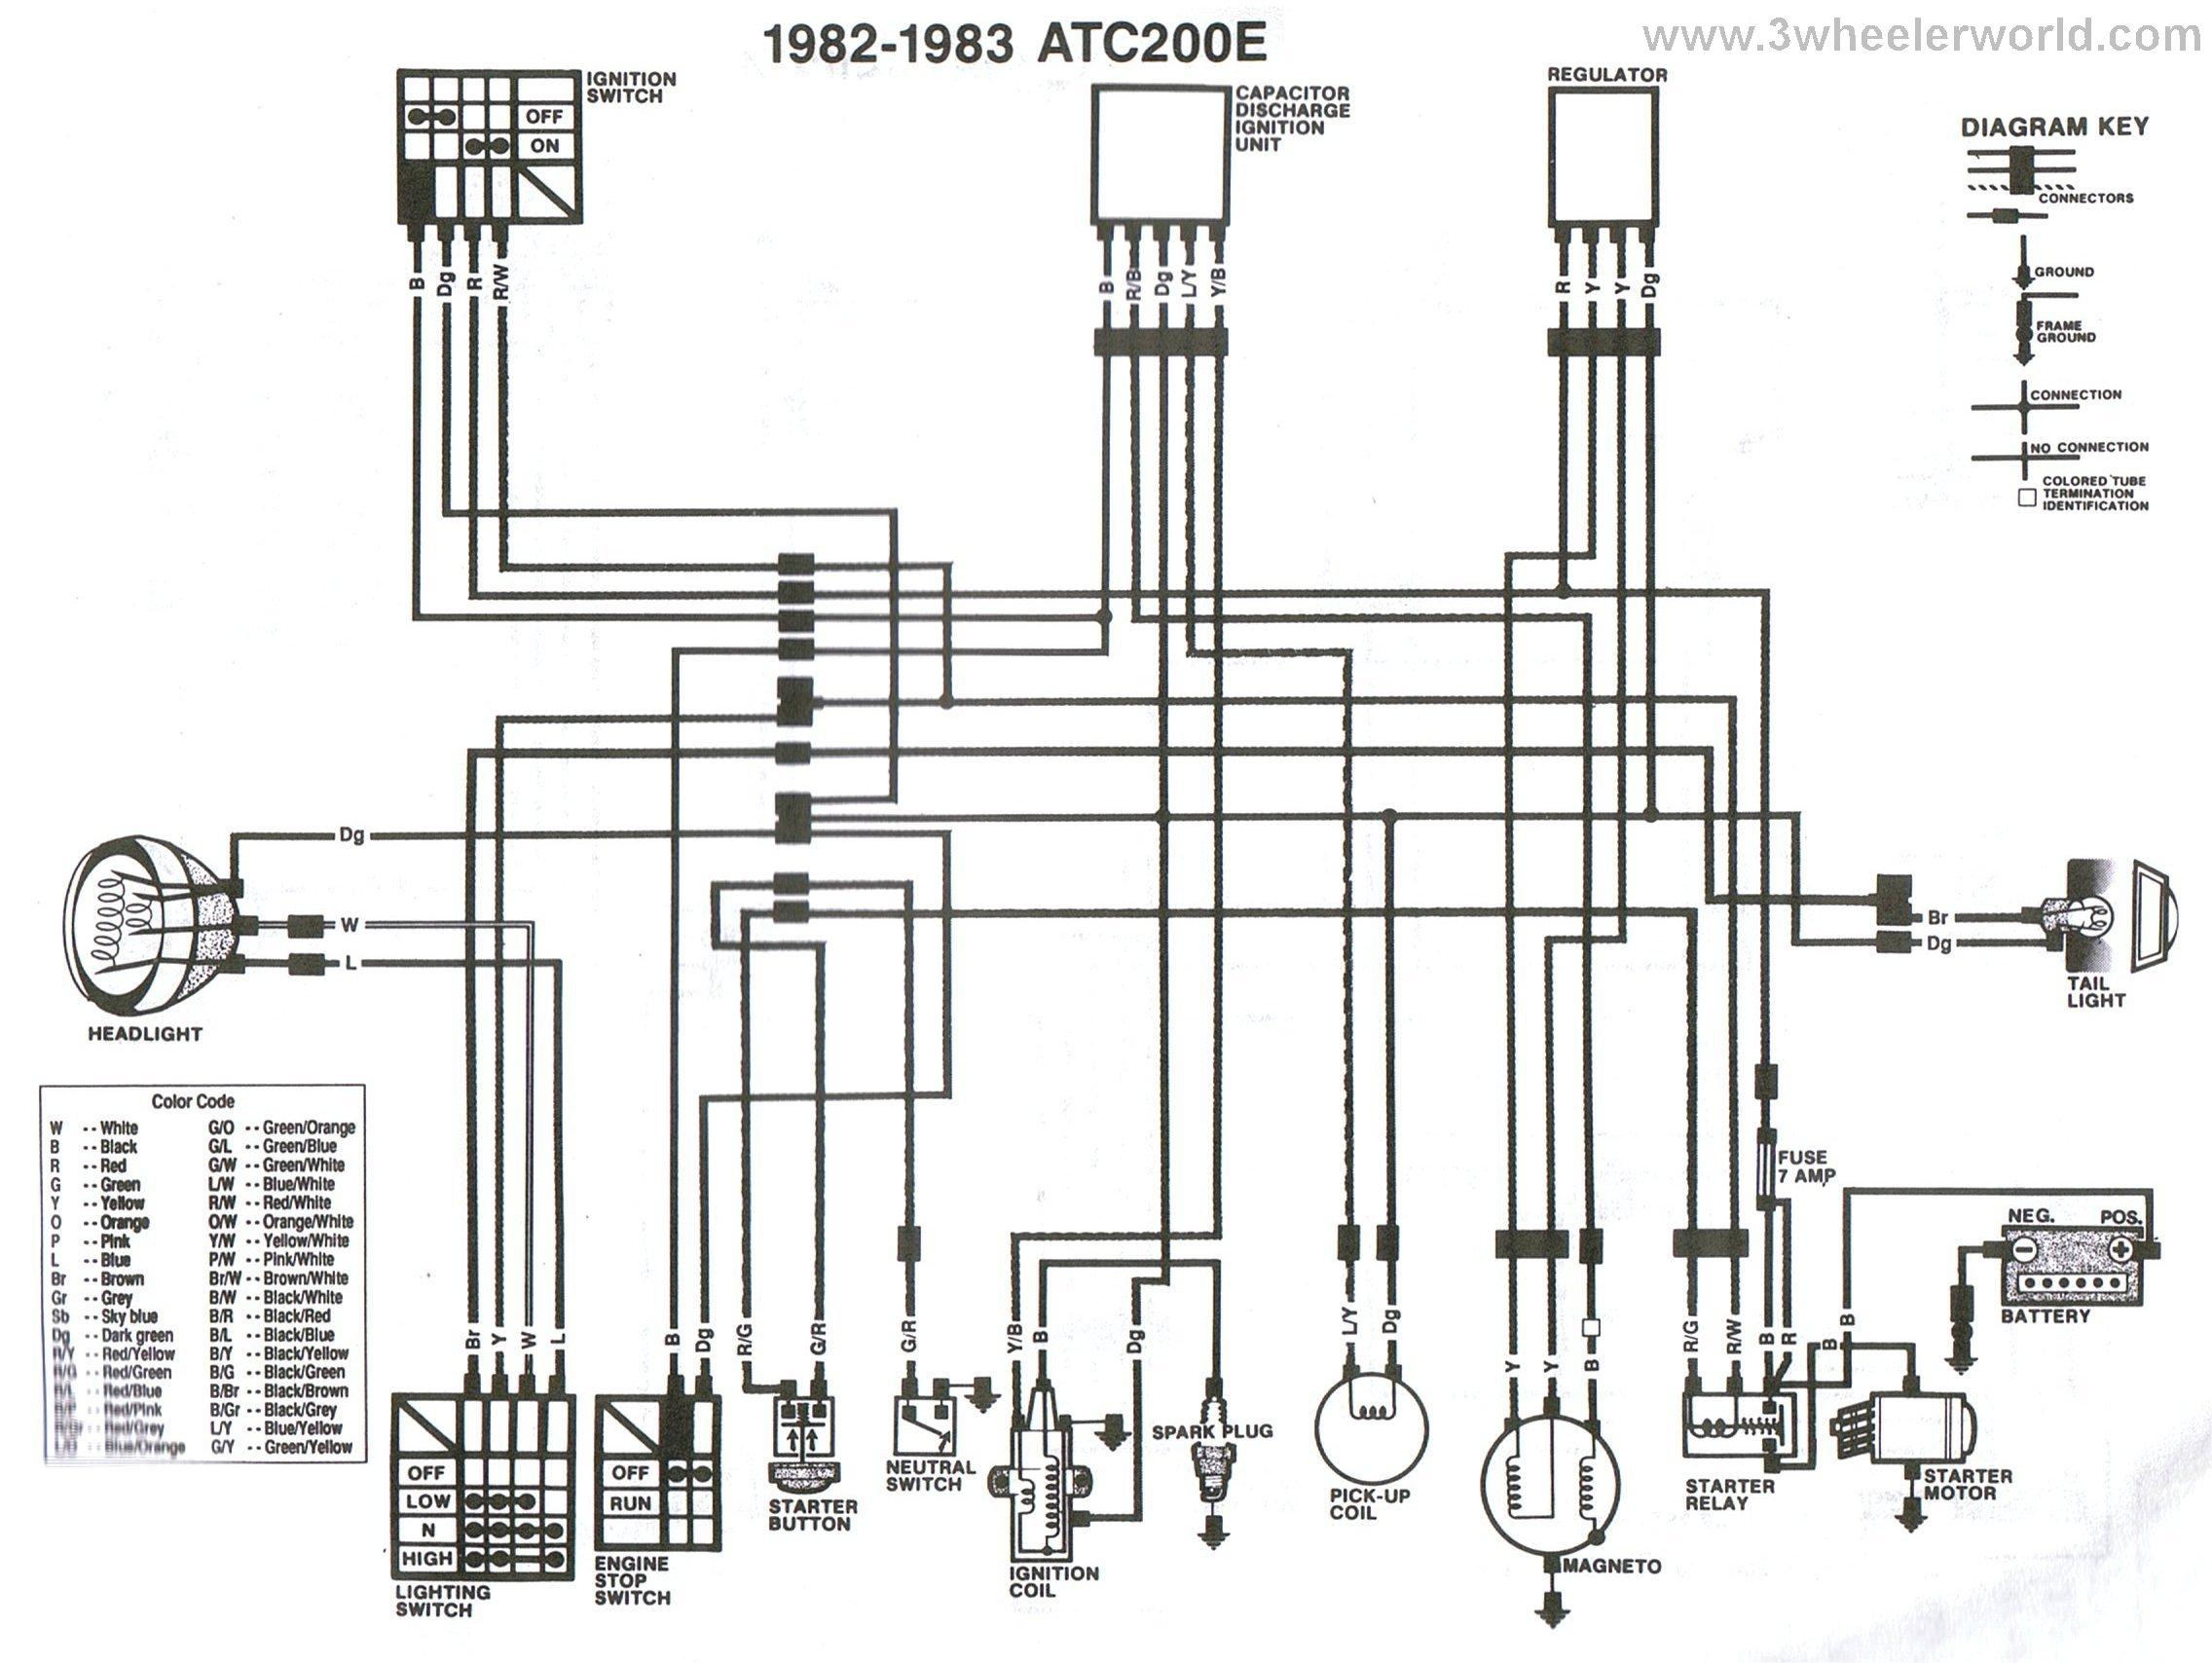 2001 Gsf600s Wiring Diagram 27 Images Trx350fe 2002 Diagrams Atc200ex82thru83resize6652c500